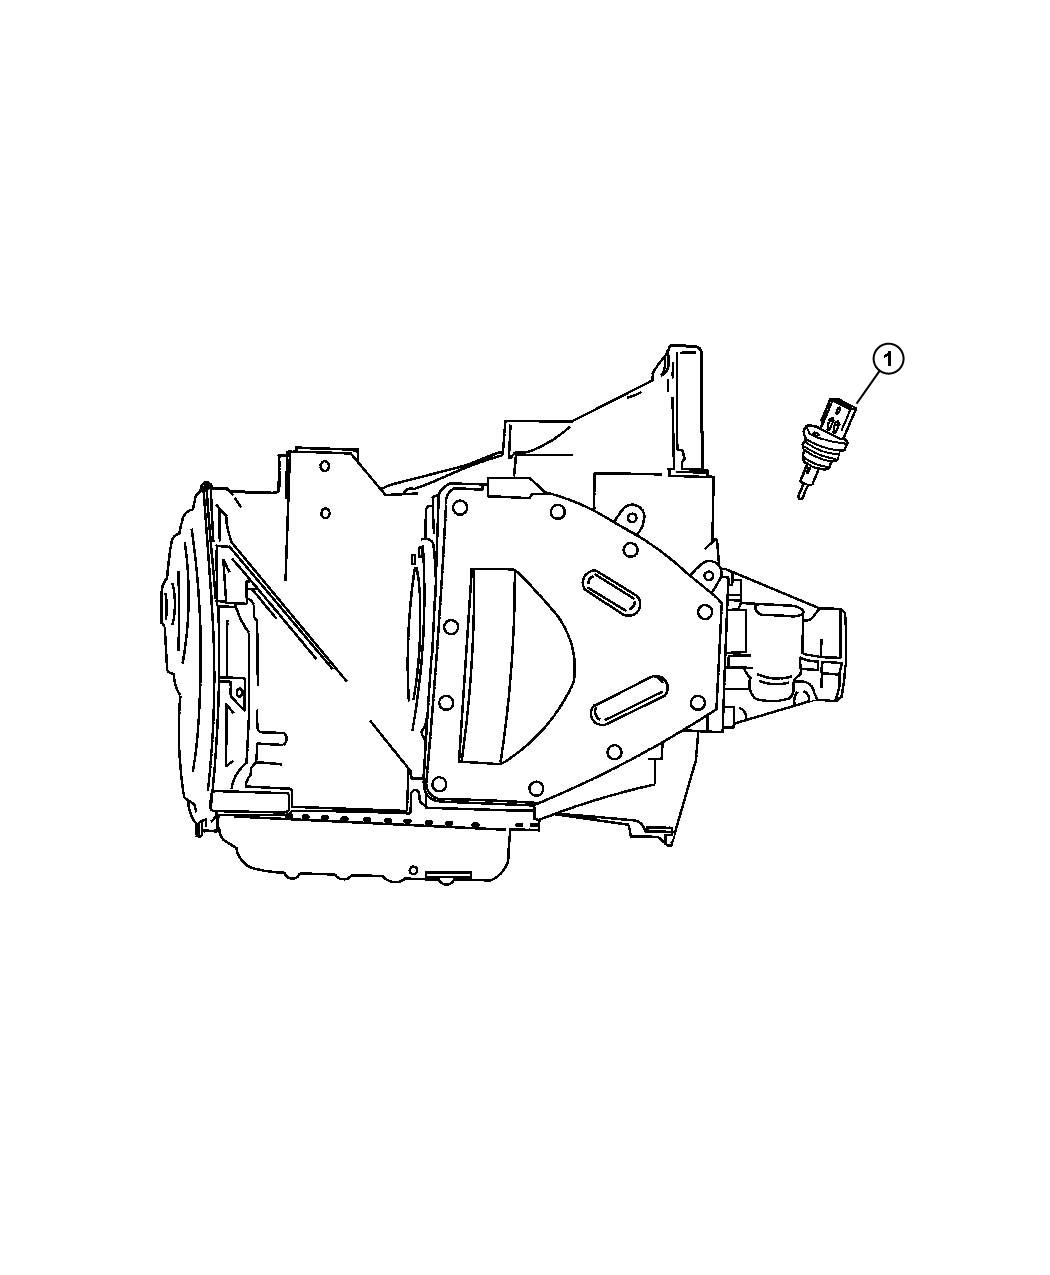 Dodge Neon Sensor. Vehicle speed. Speedometer, pinion